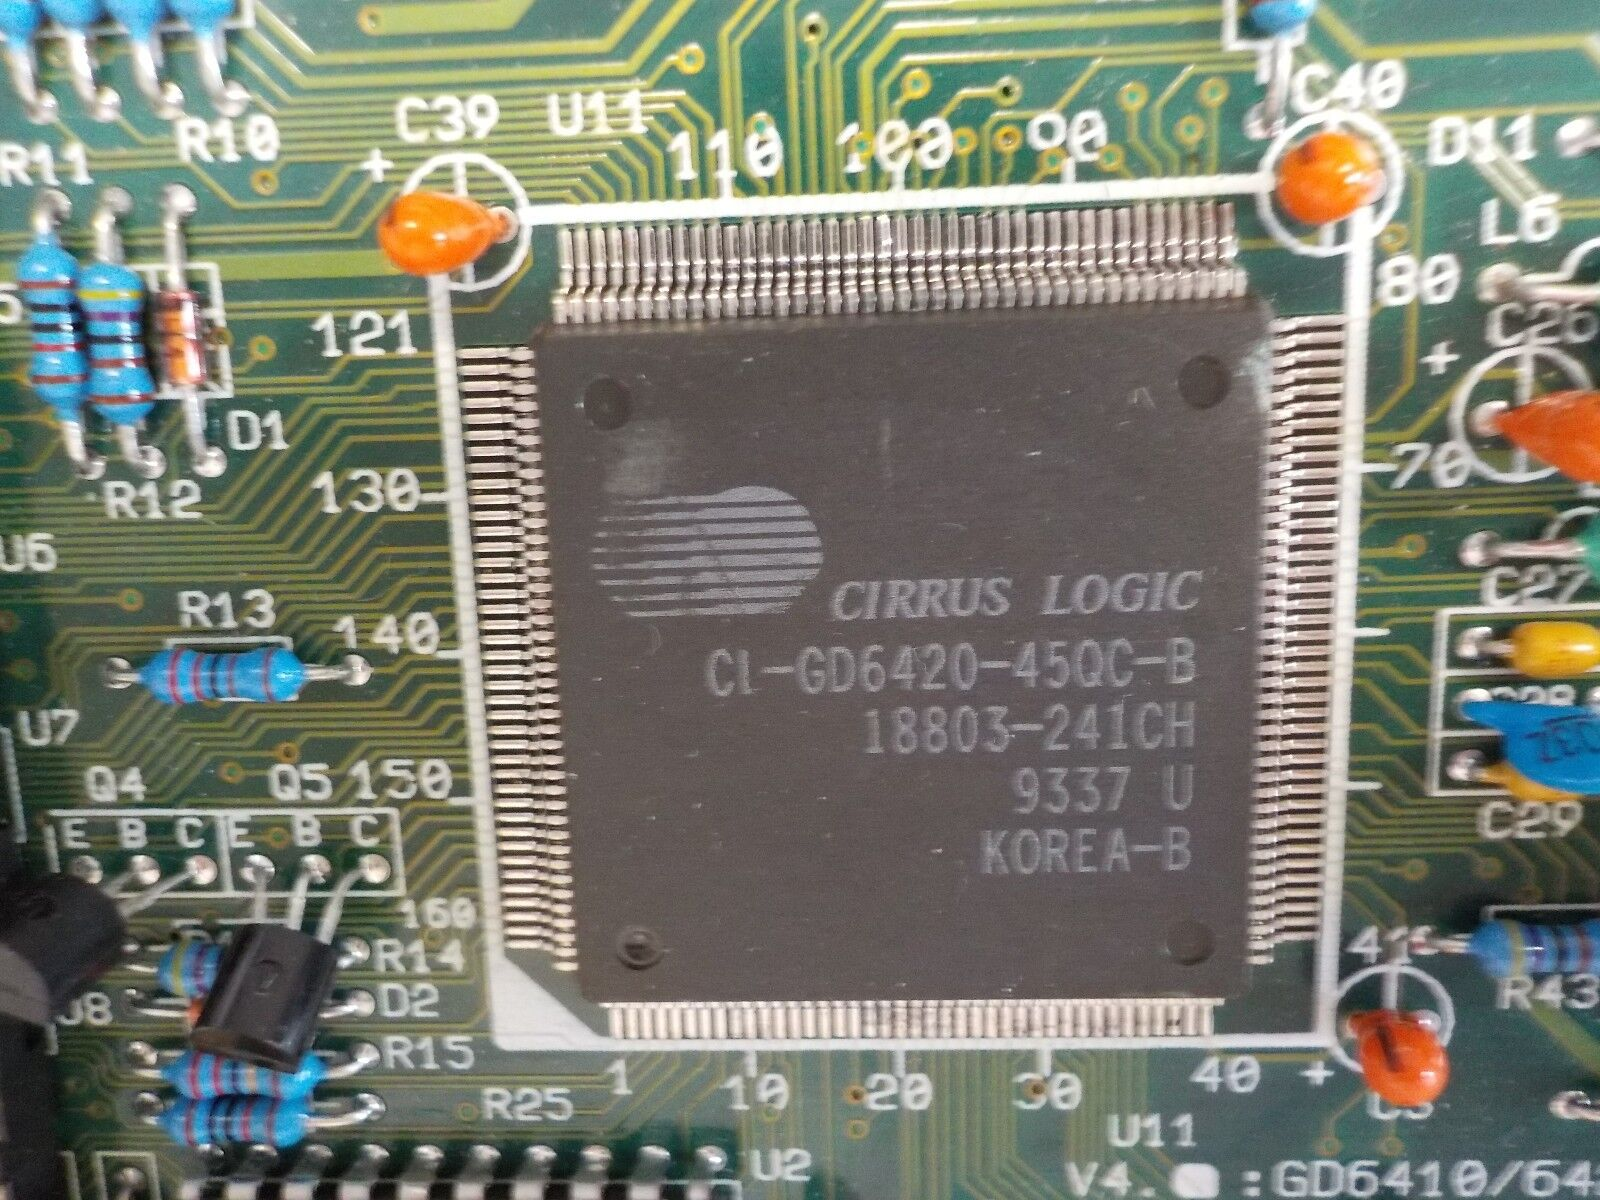 Cirrus Logic Cl Gd6420 45qc B Card Circuit Board Clgd642045qcb Ebay Photo Interrupter For Digital Norton Secured Powered By Verisign